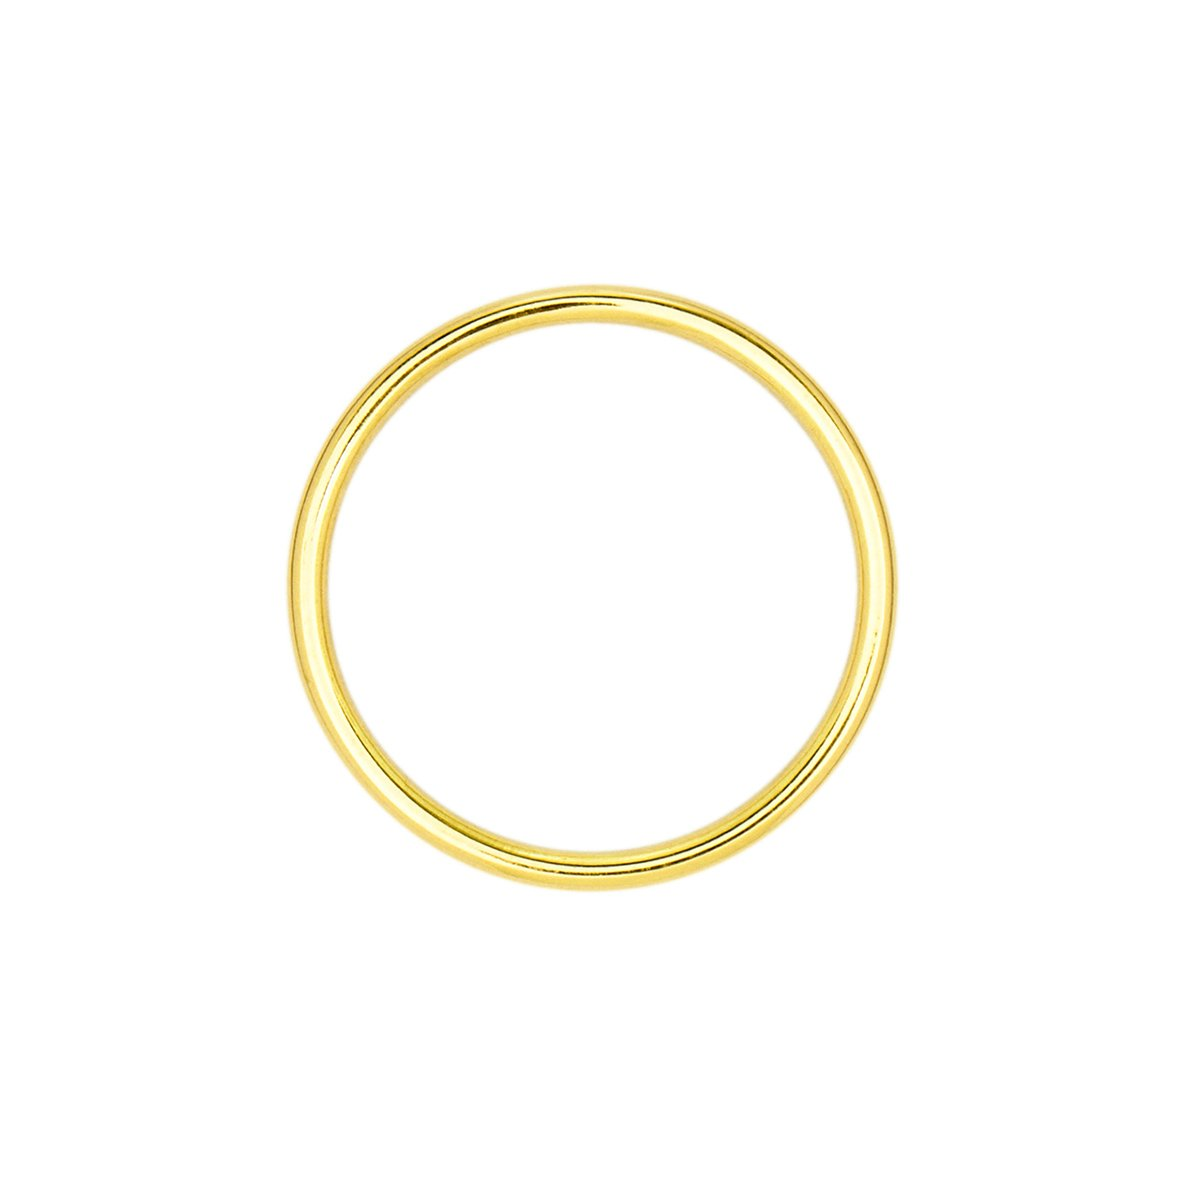 Anel Falange de Ouro Amarelo O de Officinale